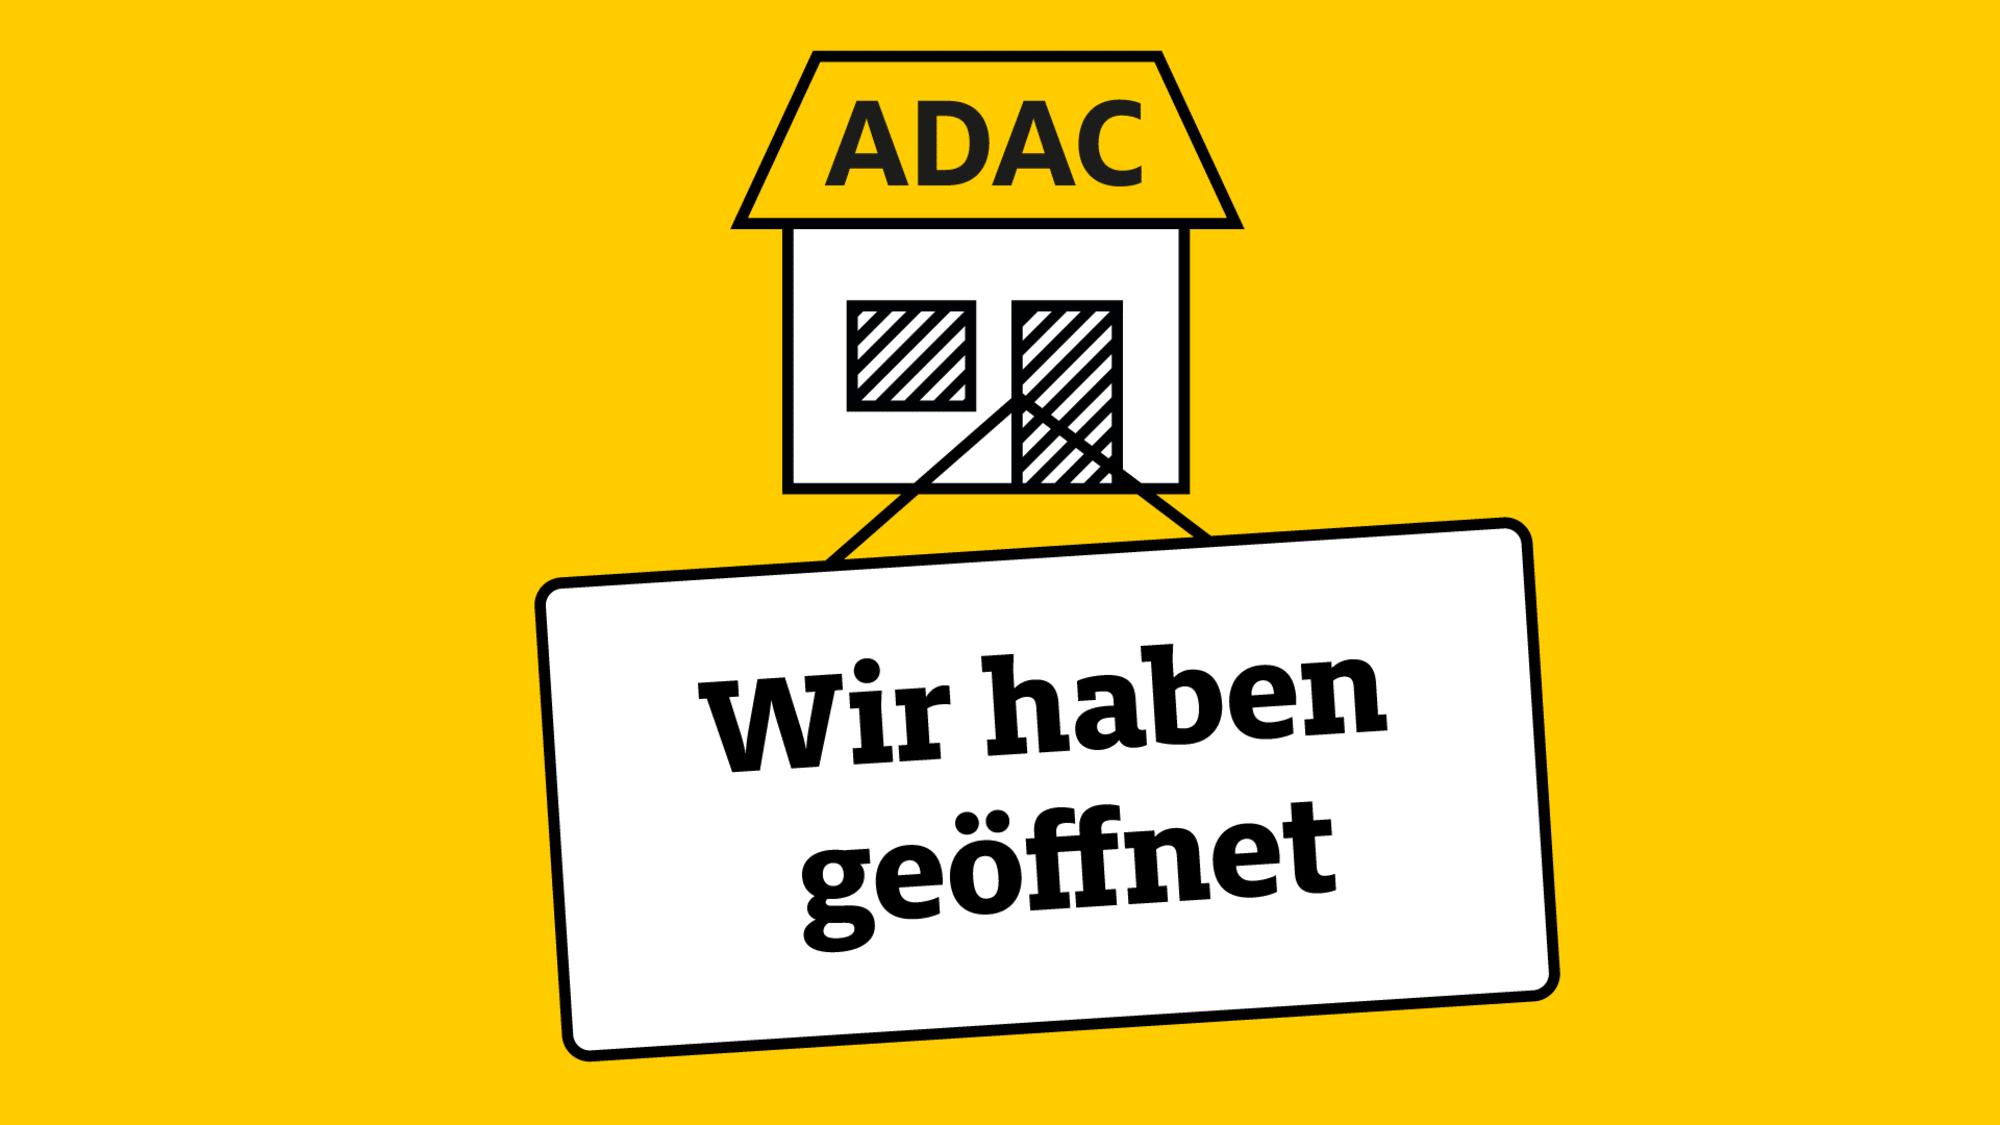 Schild ADAC Geschaeftsstellen sind wieder geoeffnet